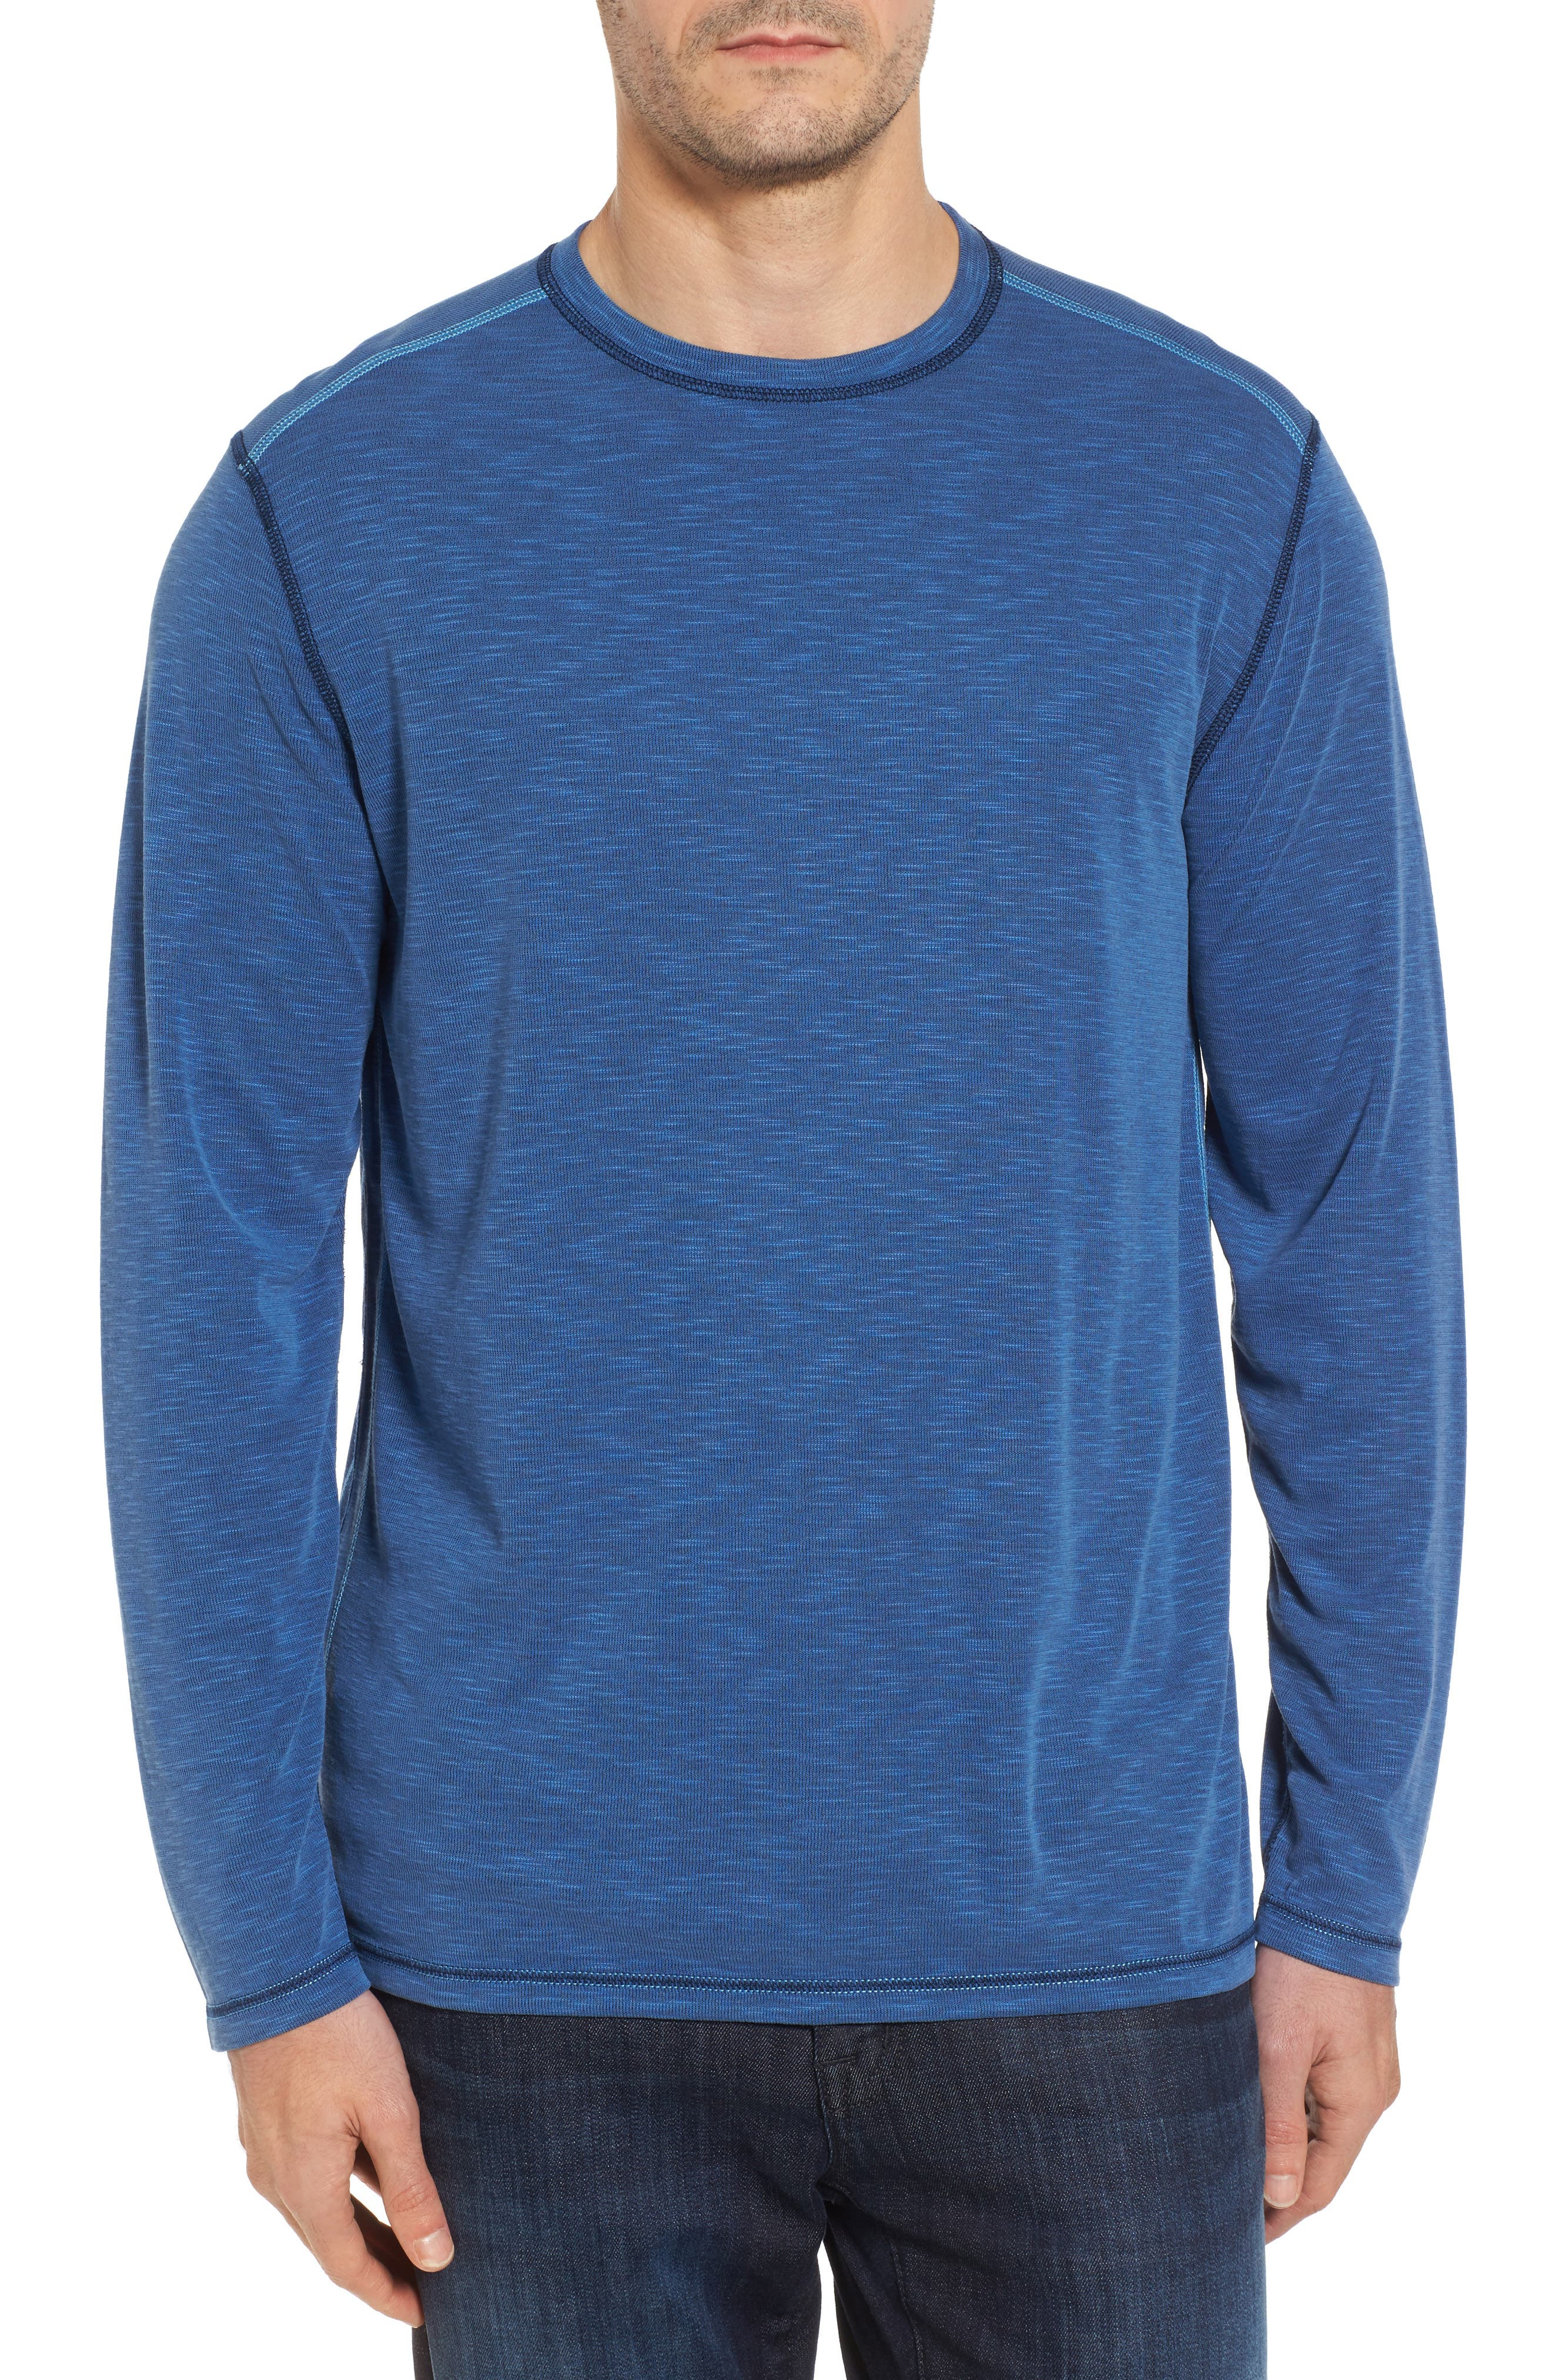 Flip Tide Standard Fit T-Shirt,                         Main,                         color, GALAXY BLUE